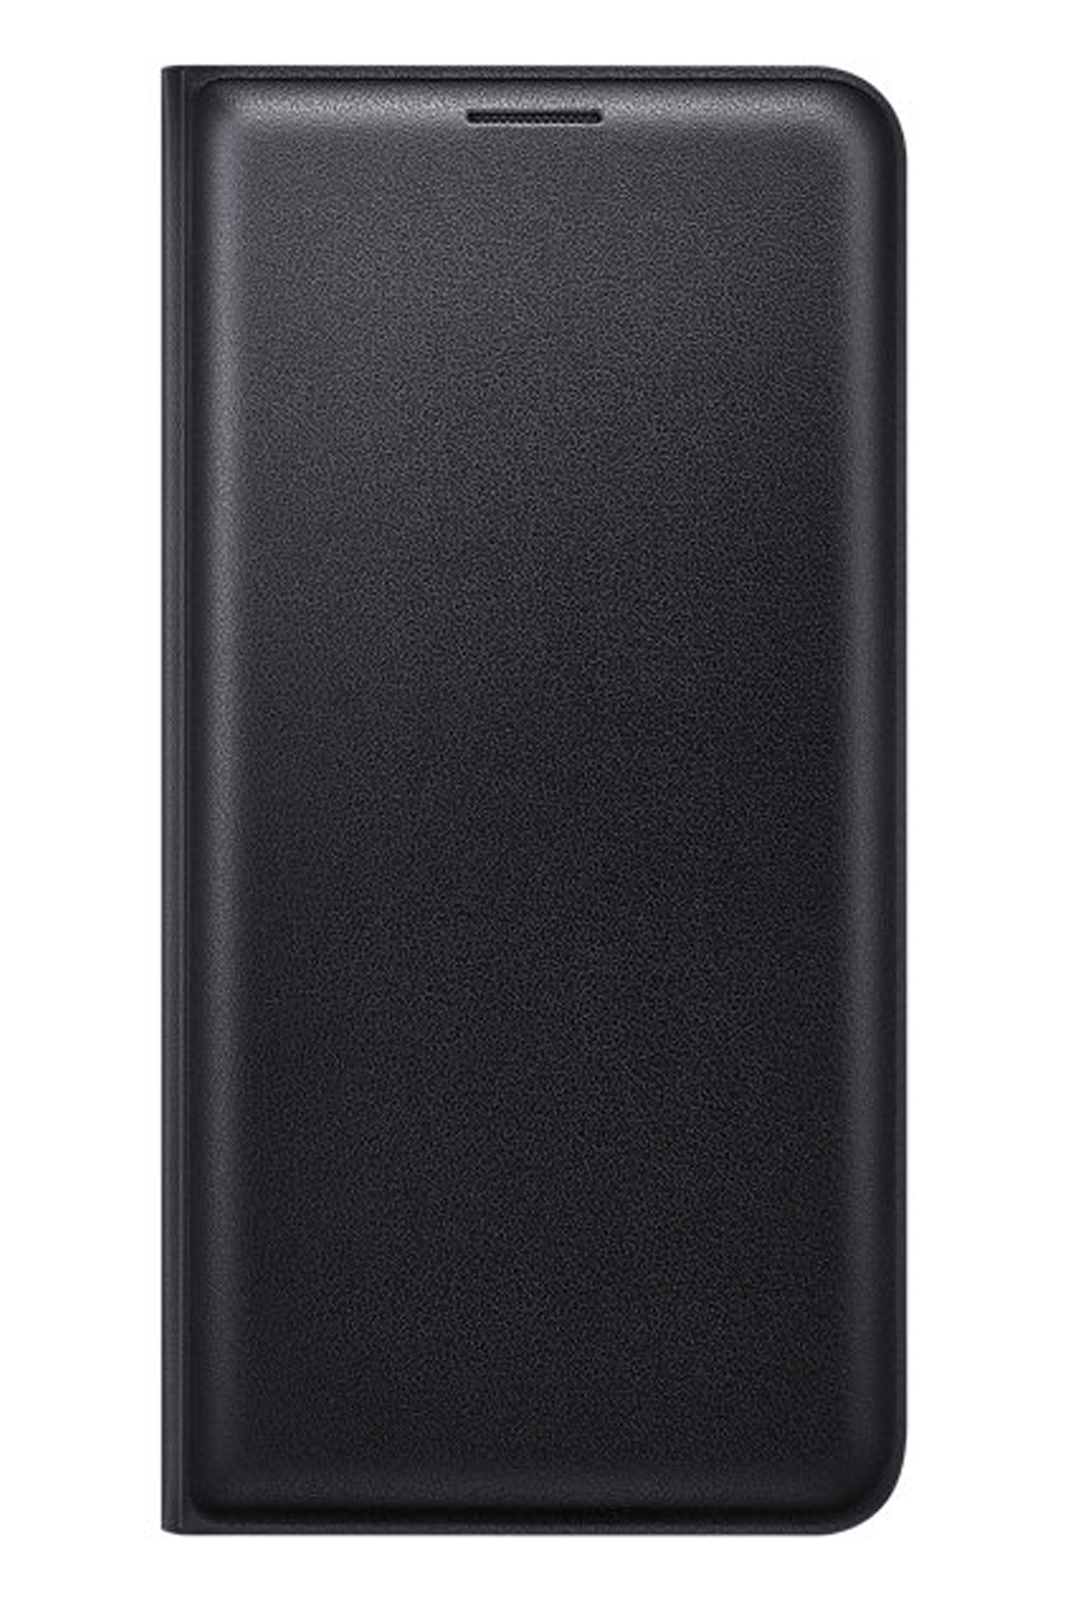 best service cea04 81bee Details about Official Samsung Galaxy J5 2016, SM-J510 Black Flip Wallet  Cover - EF-WJ510PBEGW